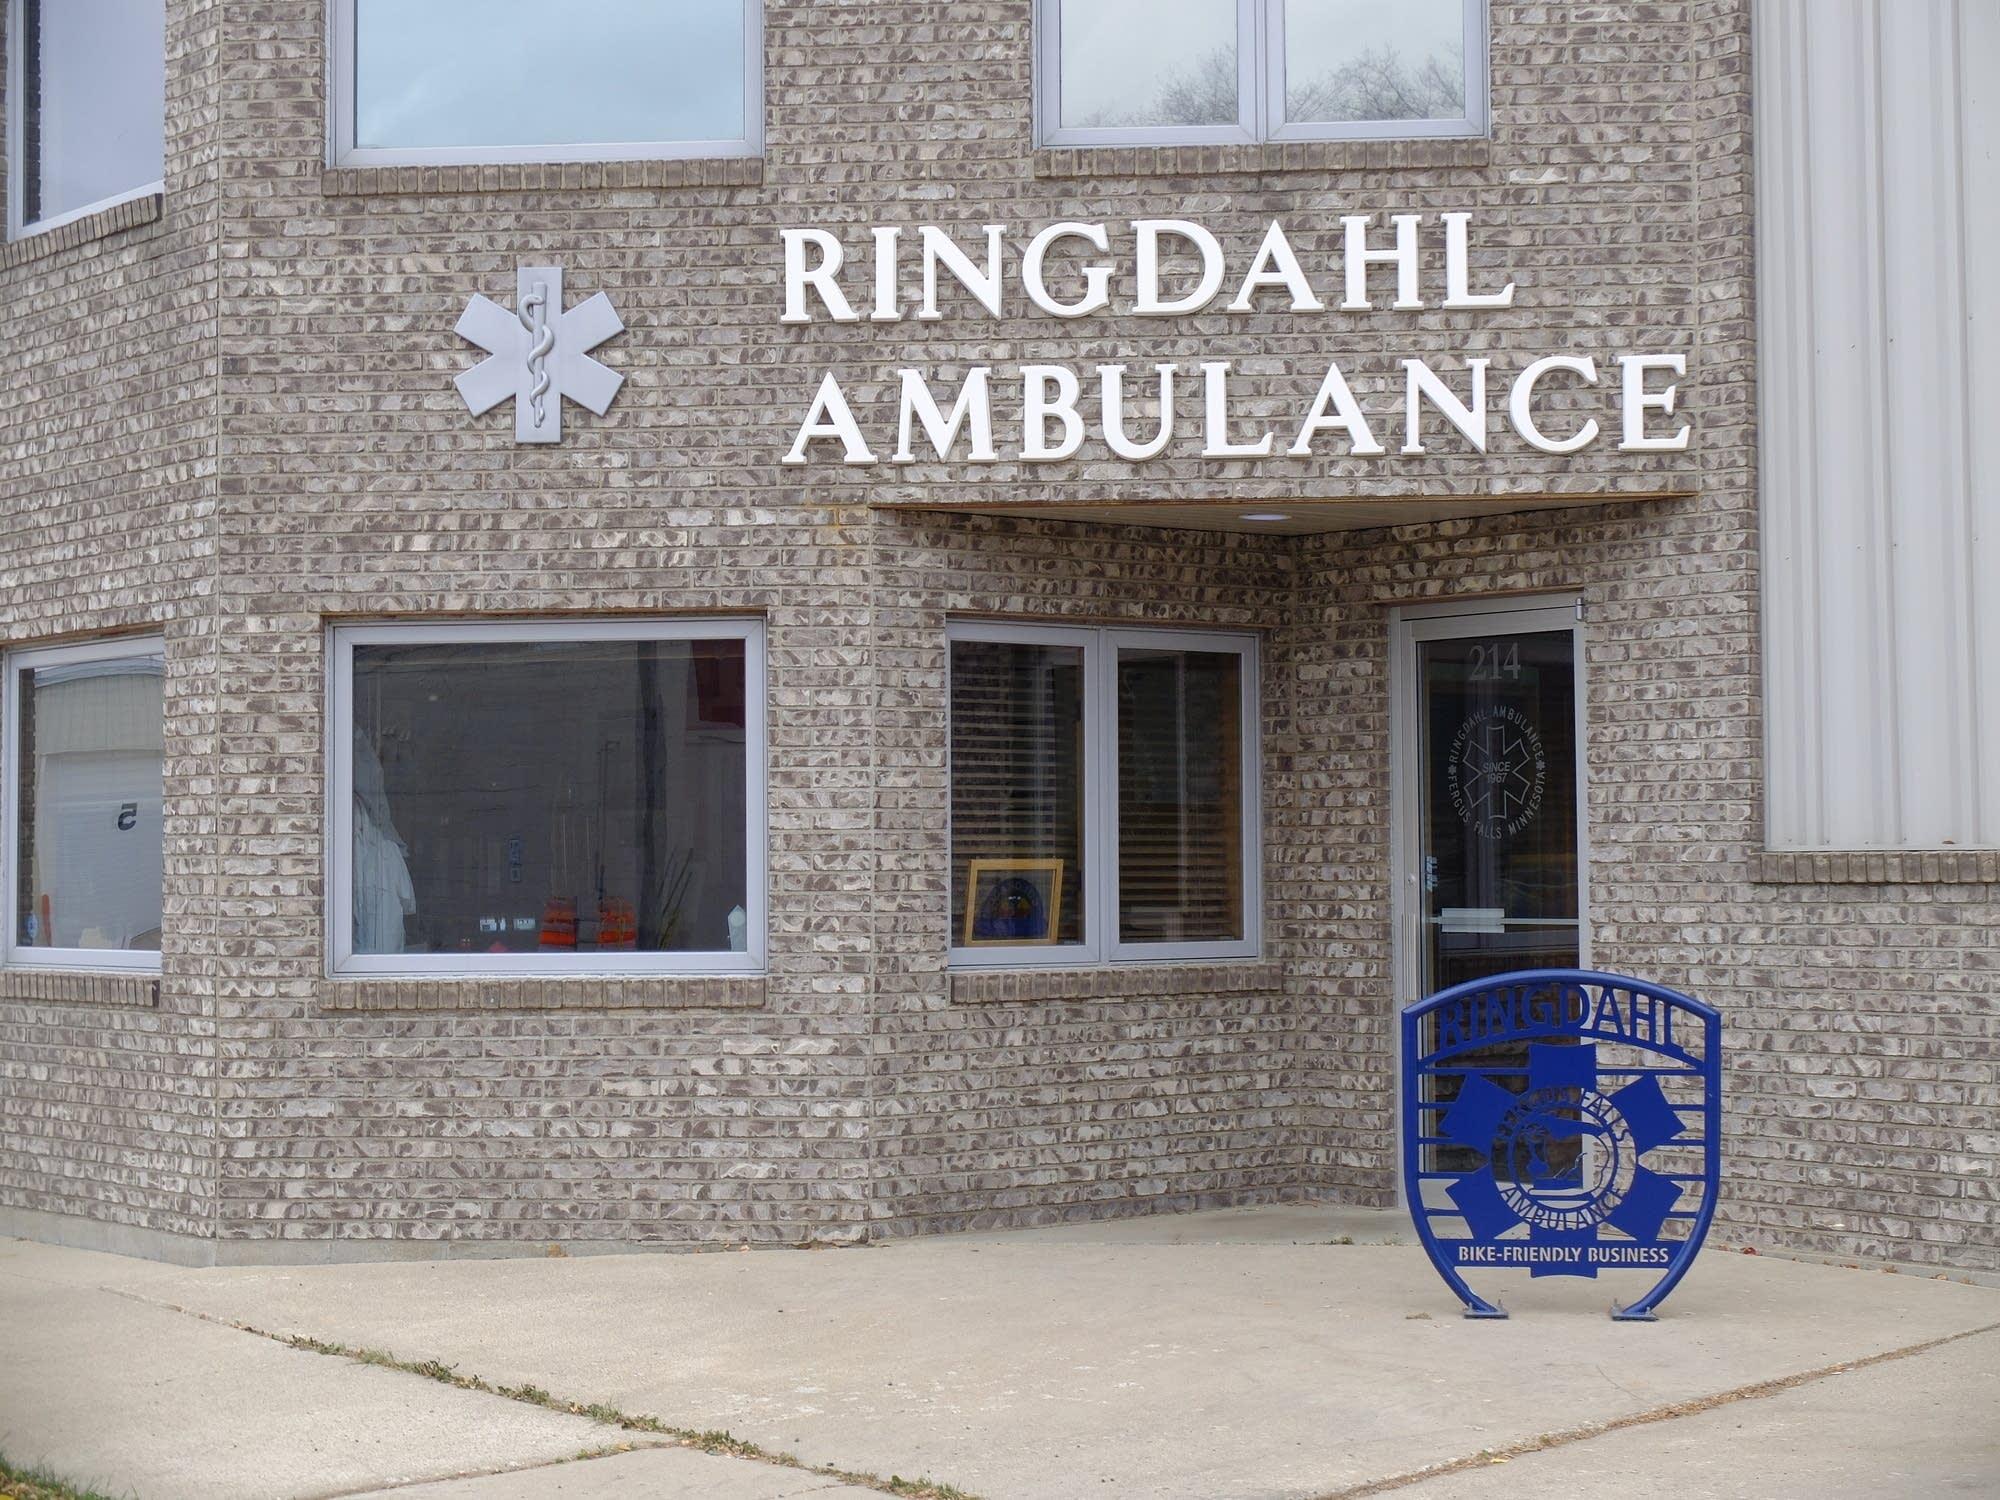 Ringdahl Ambulance Service in Fergus Falls.